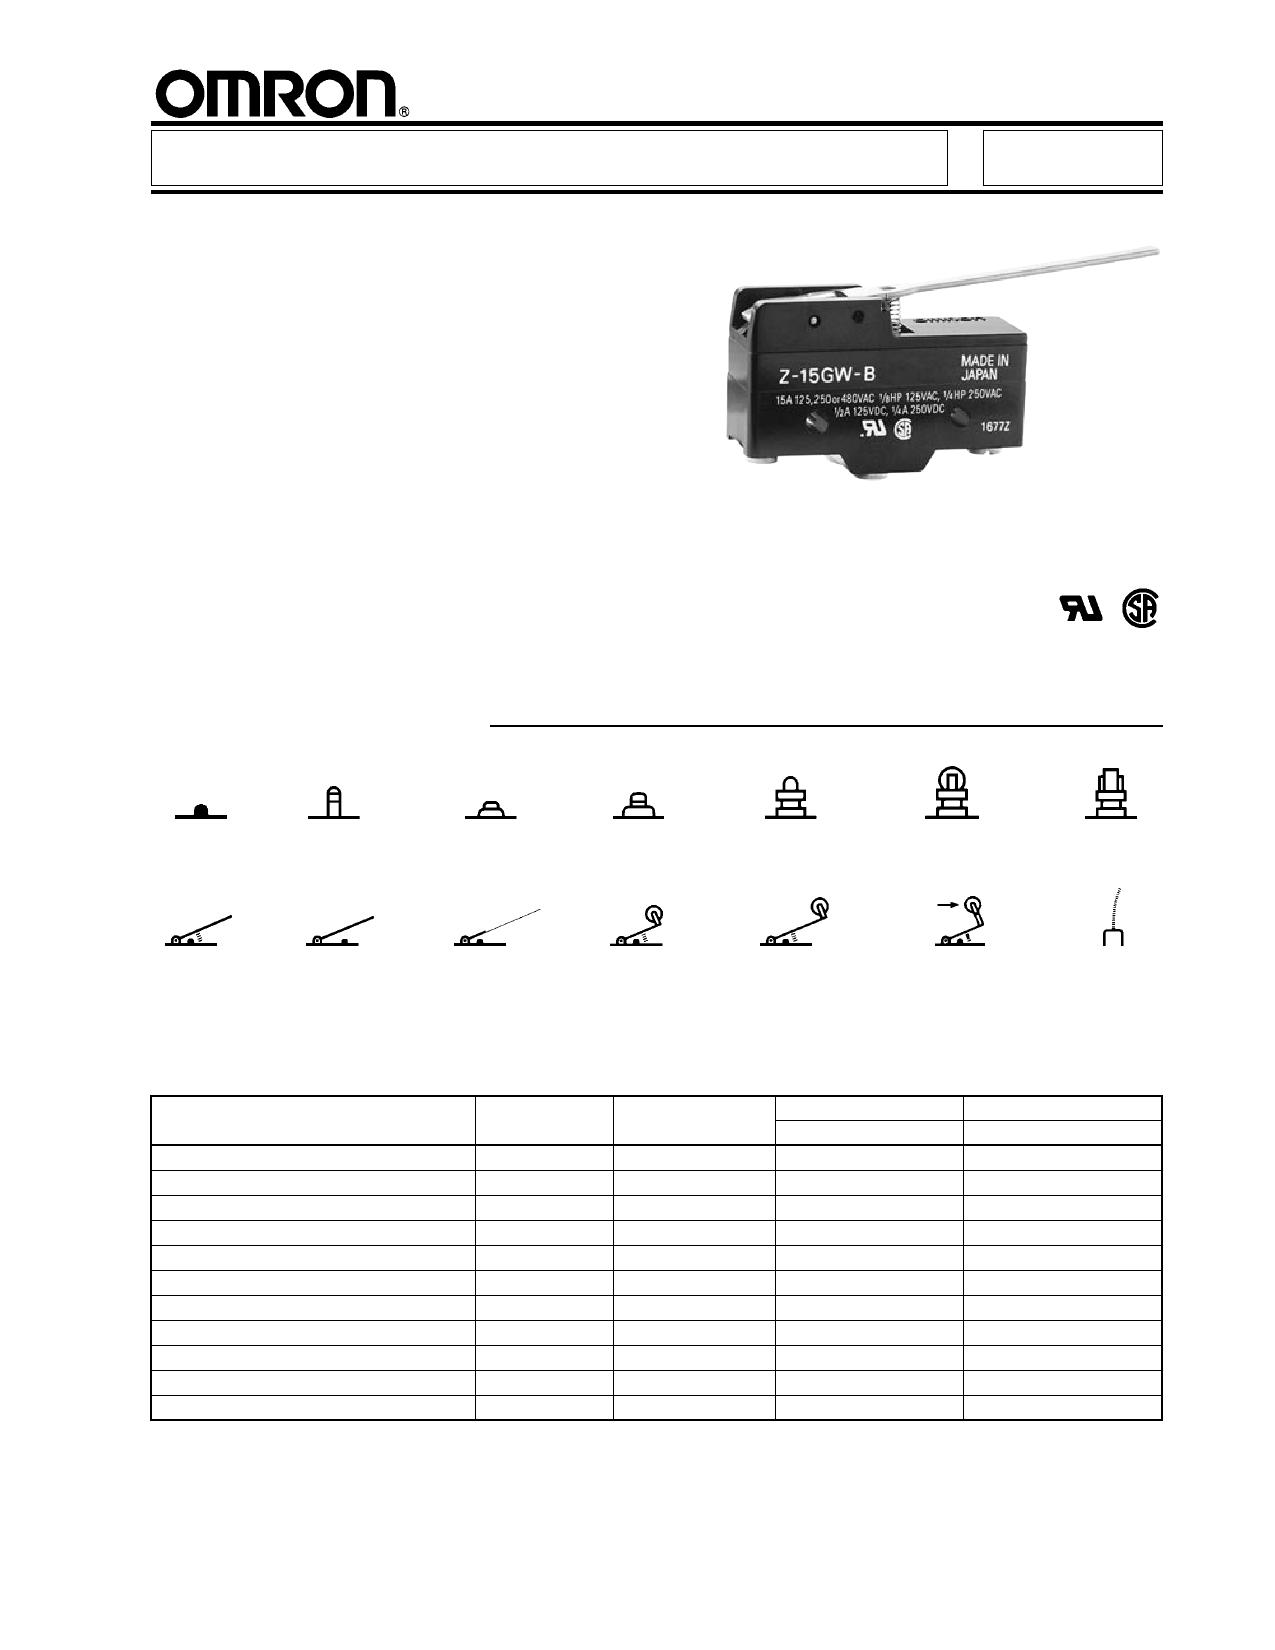 Z-15GD-B Hoja de datos, Descripción, Manual